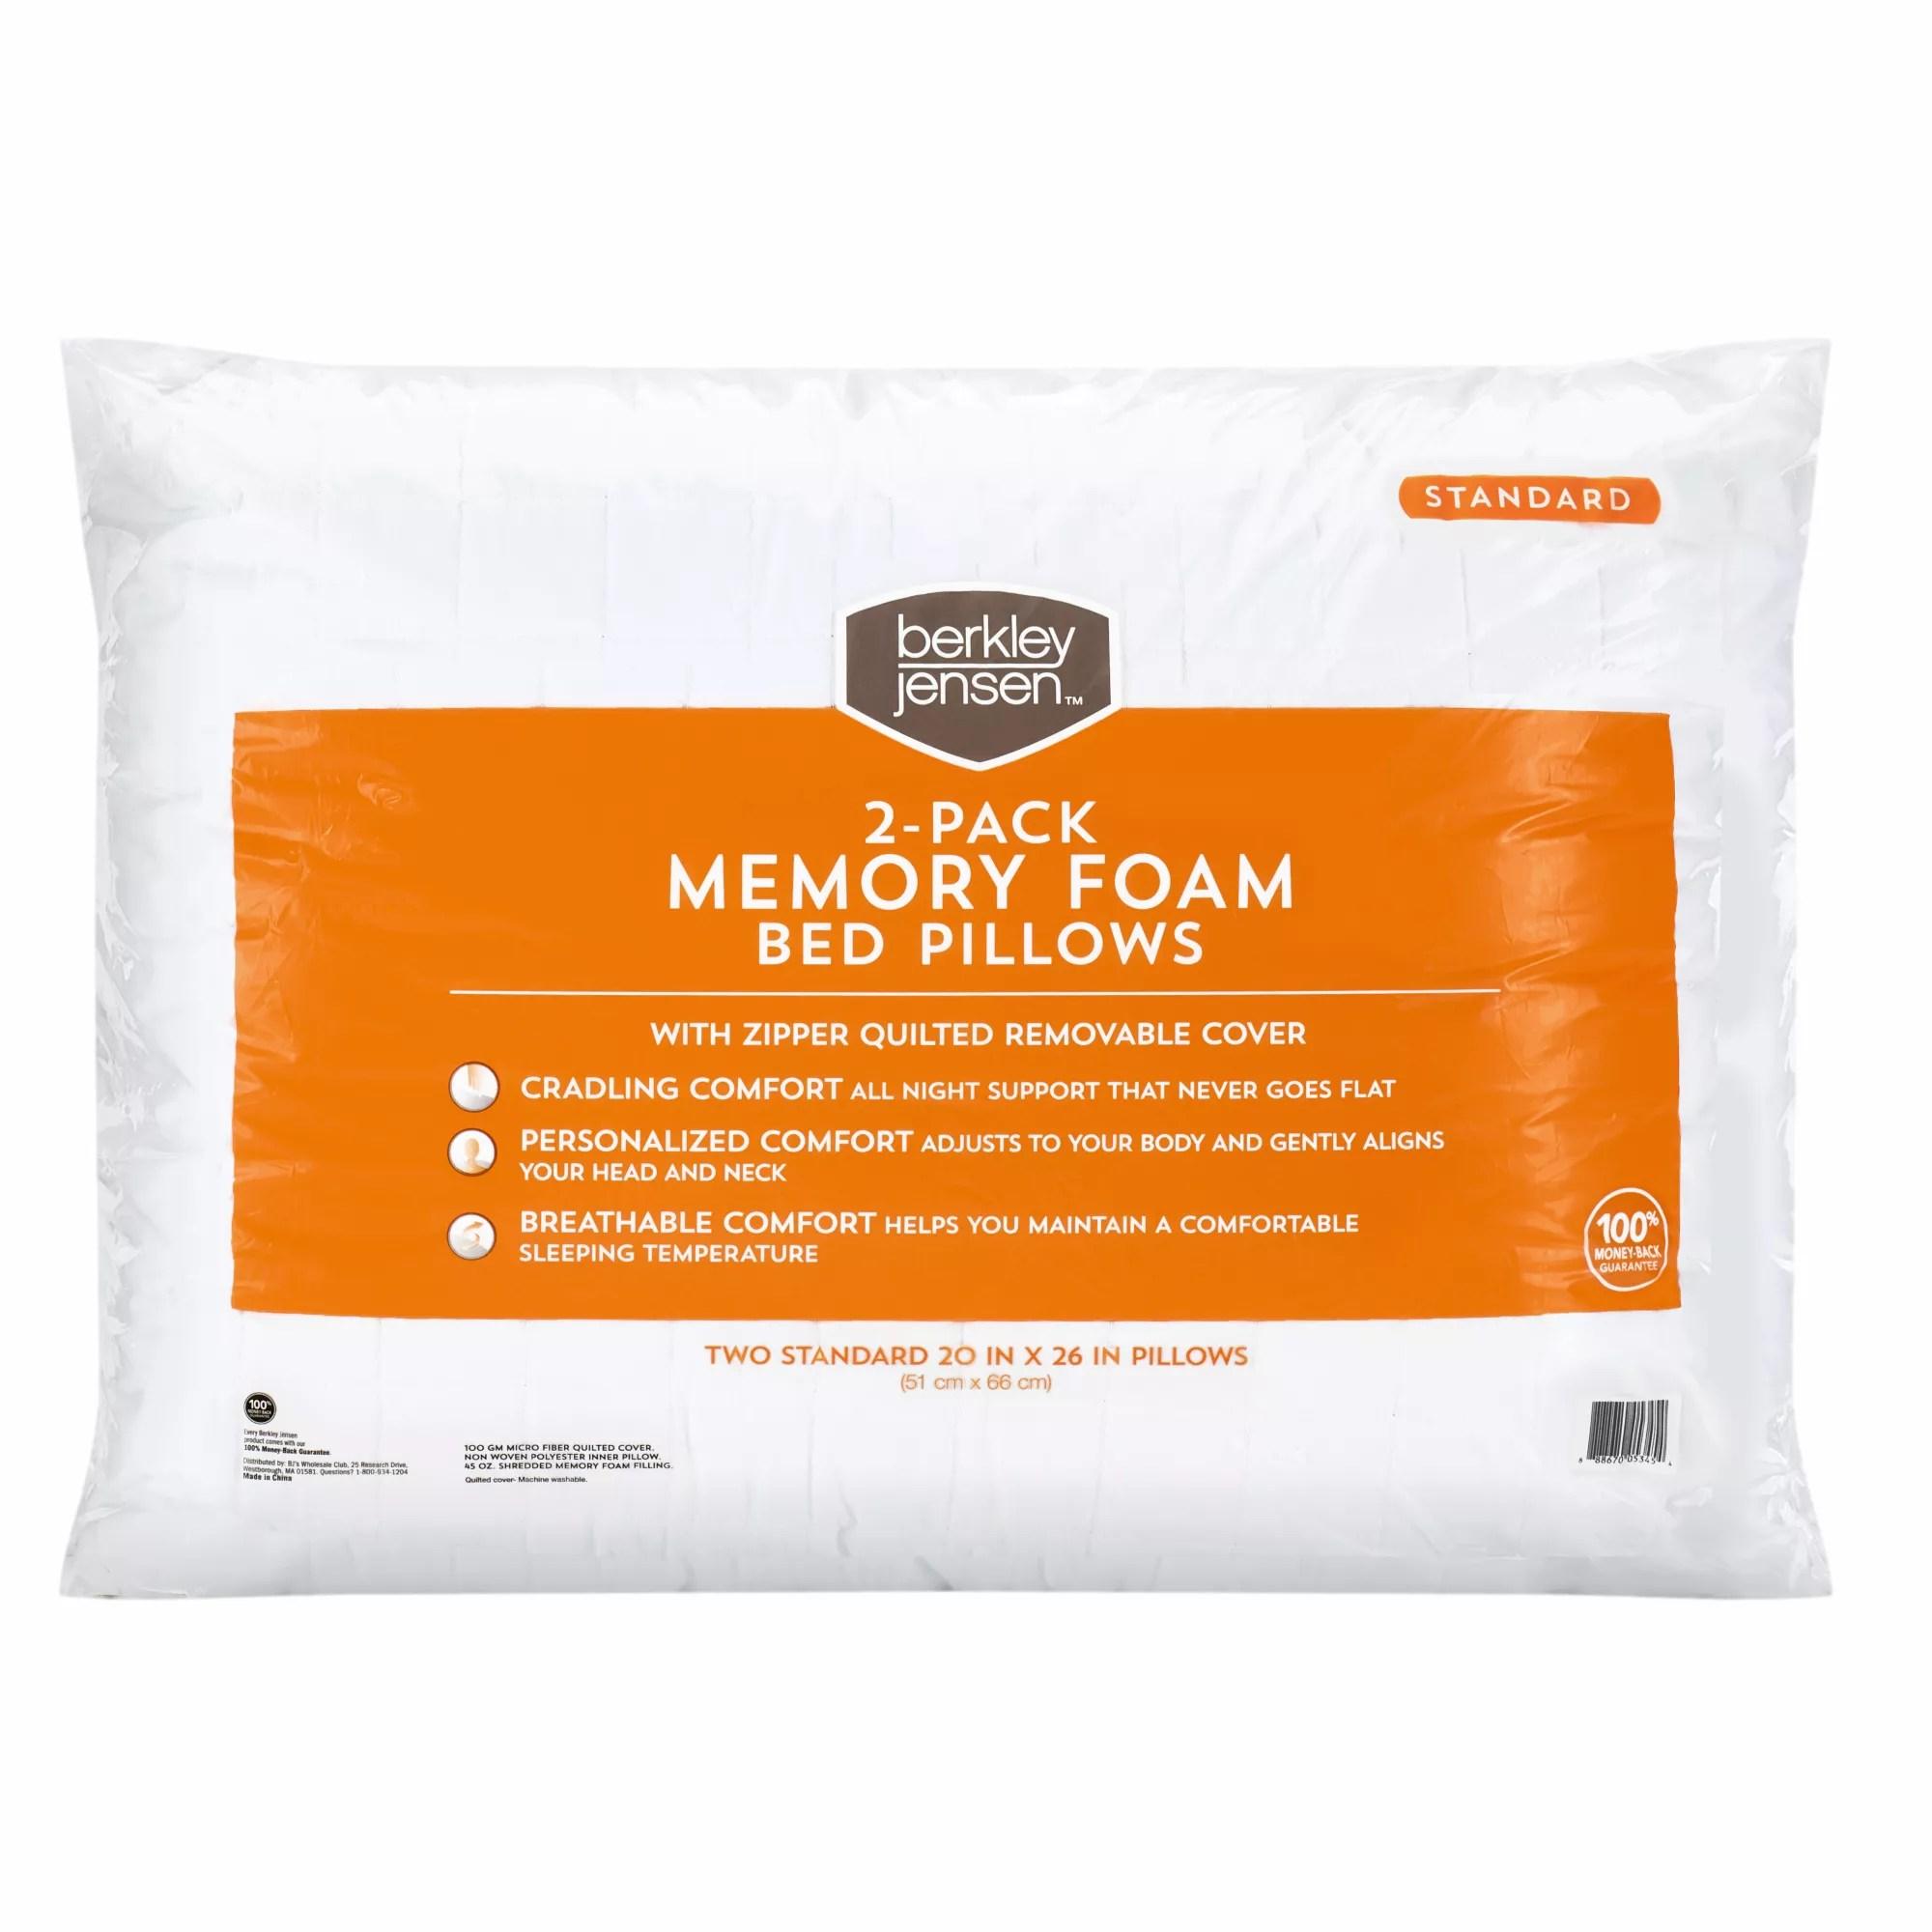 berkley jensen standard size memory foam pillow 2 pk